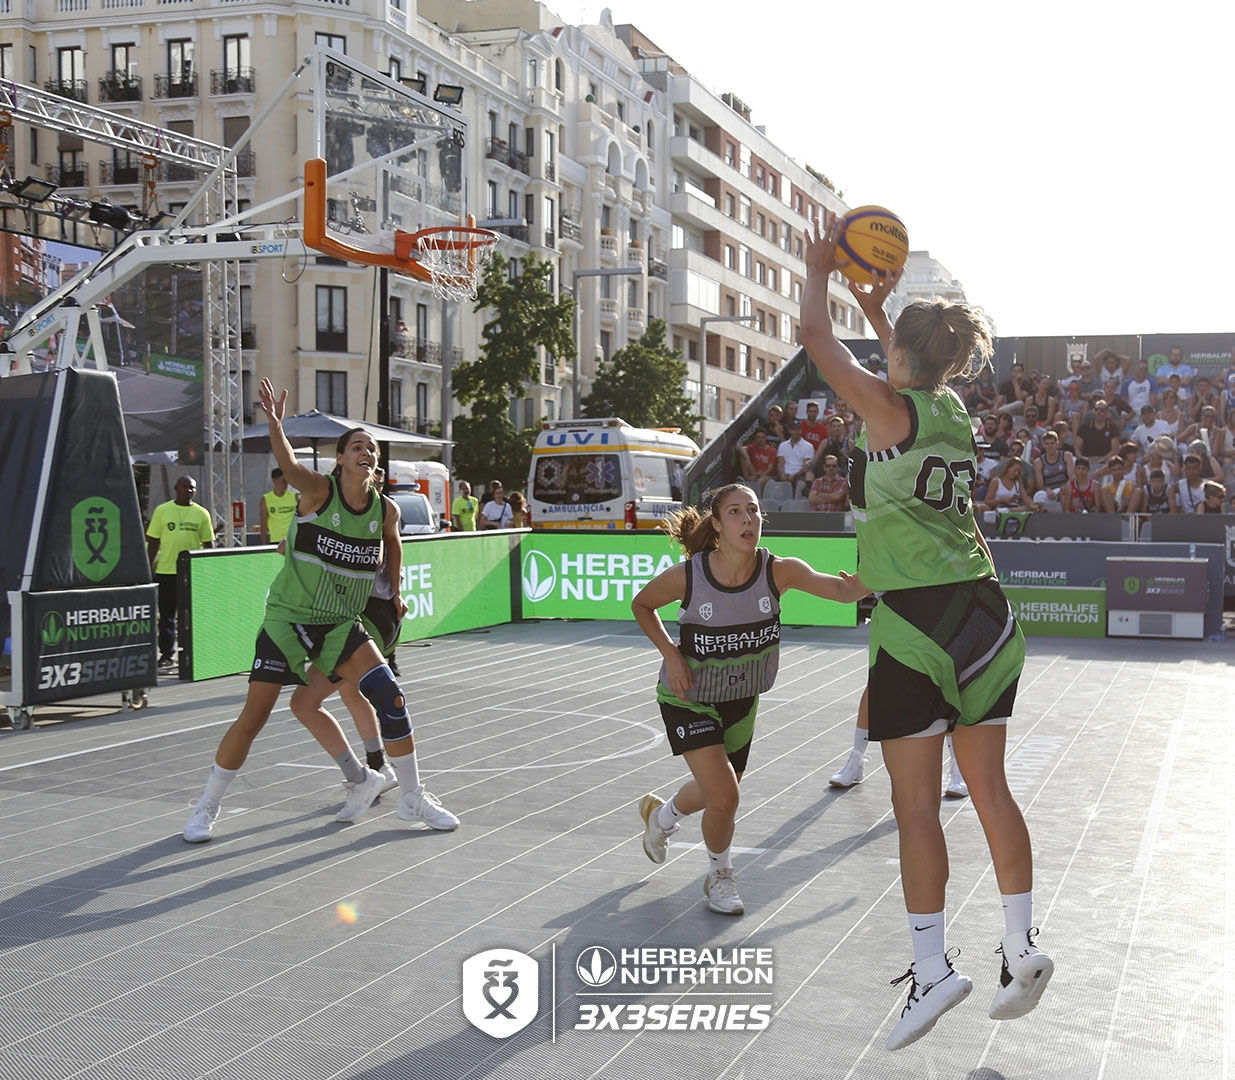 MadridOpen_Herbalife3x3Series2019_SABADO10